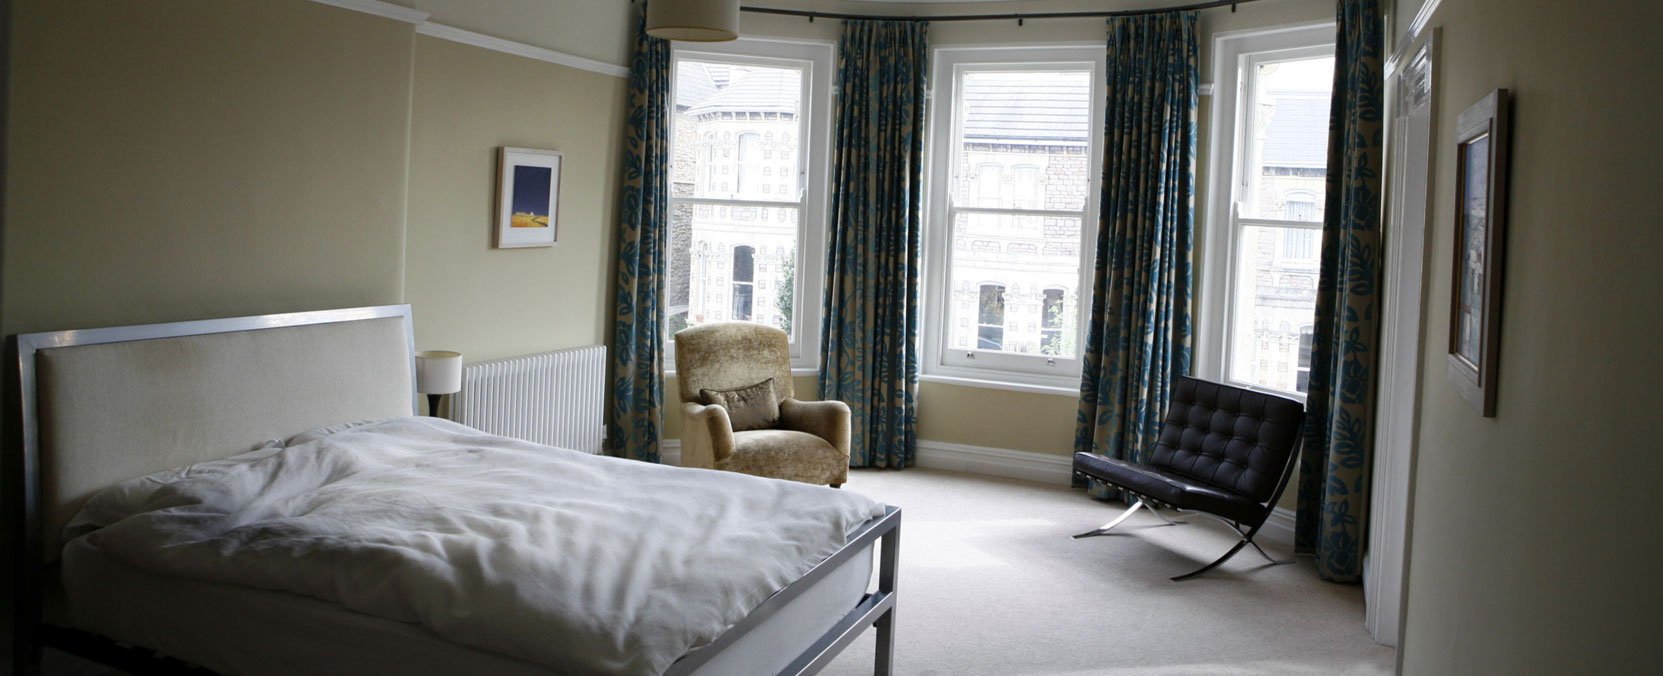 Bristol Home Decorating Services